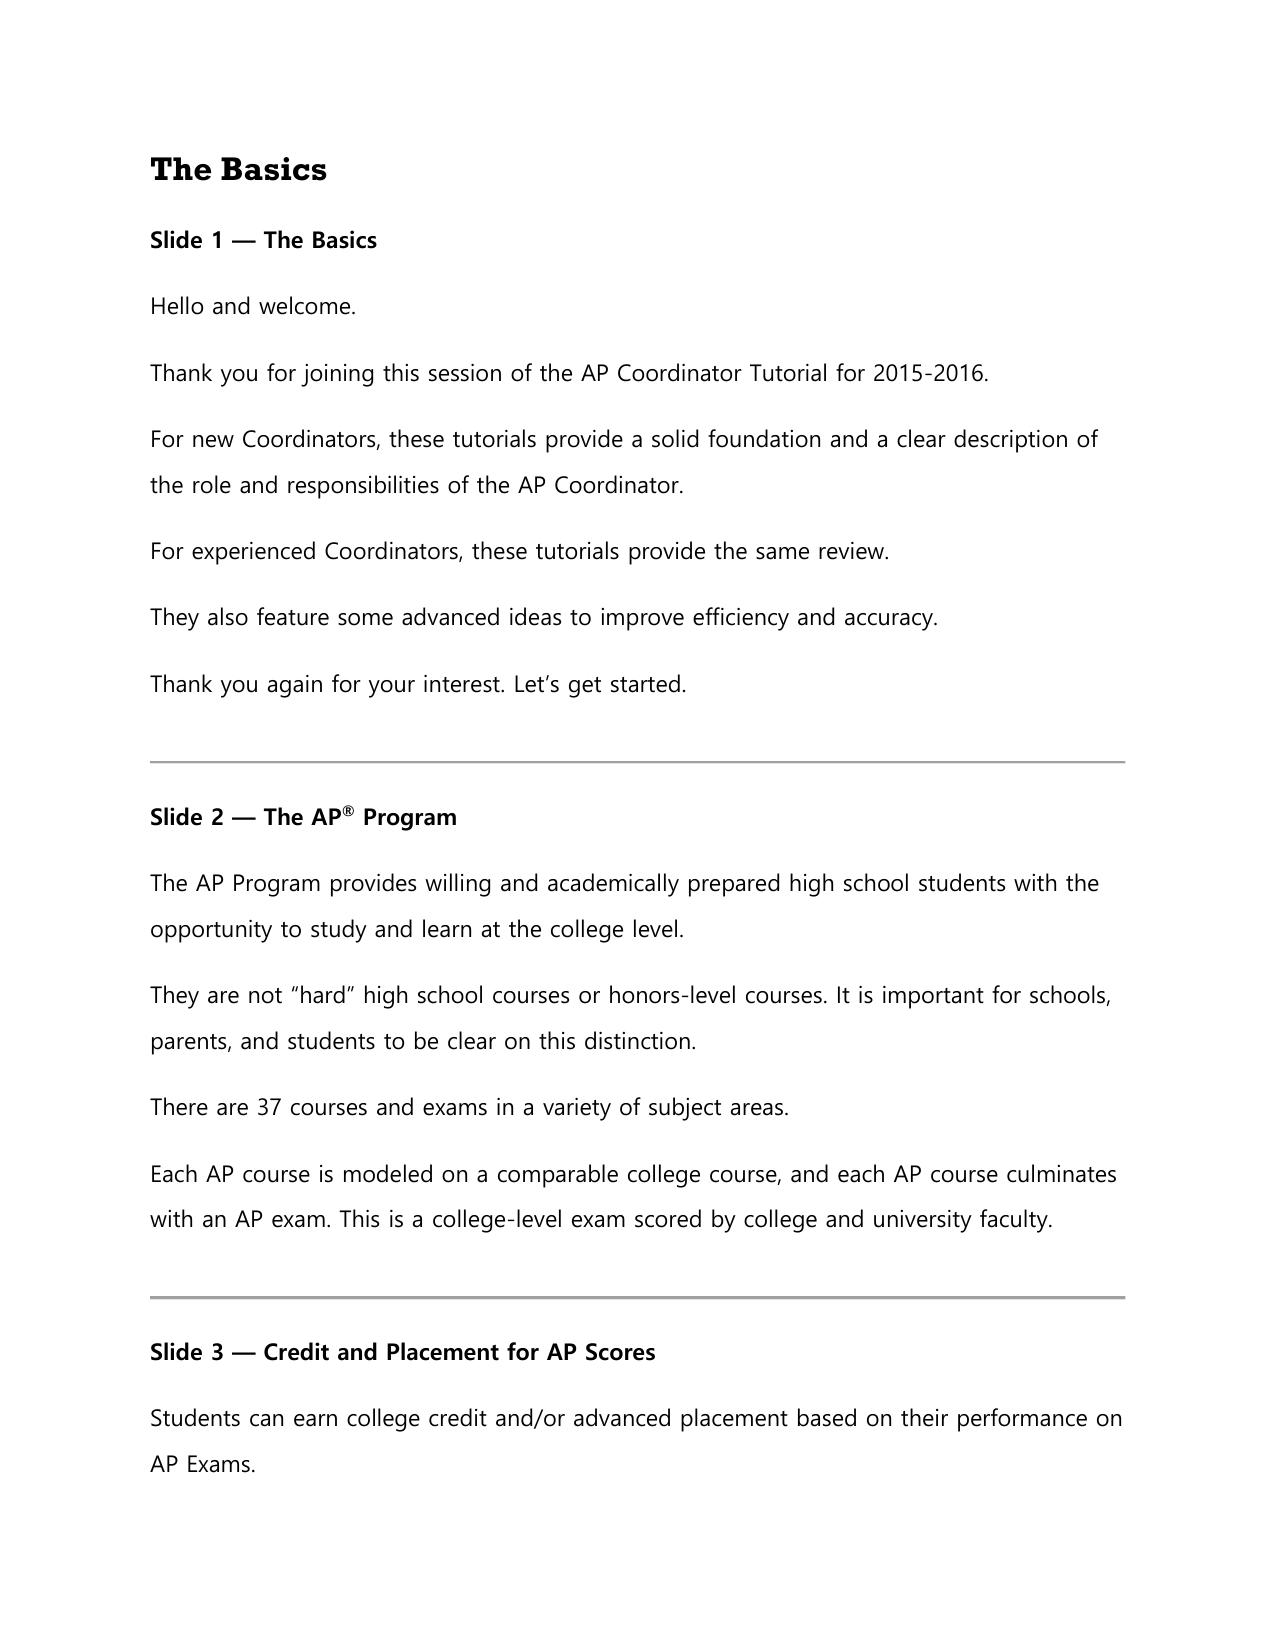 The Basics - The College Board